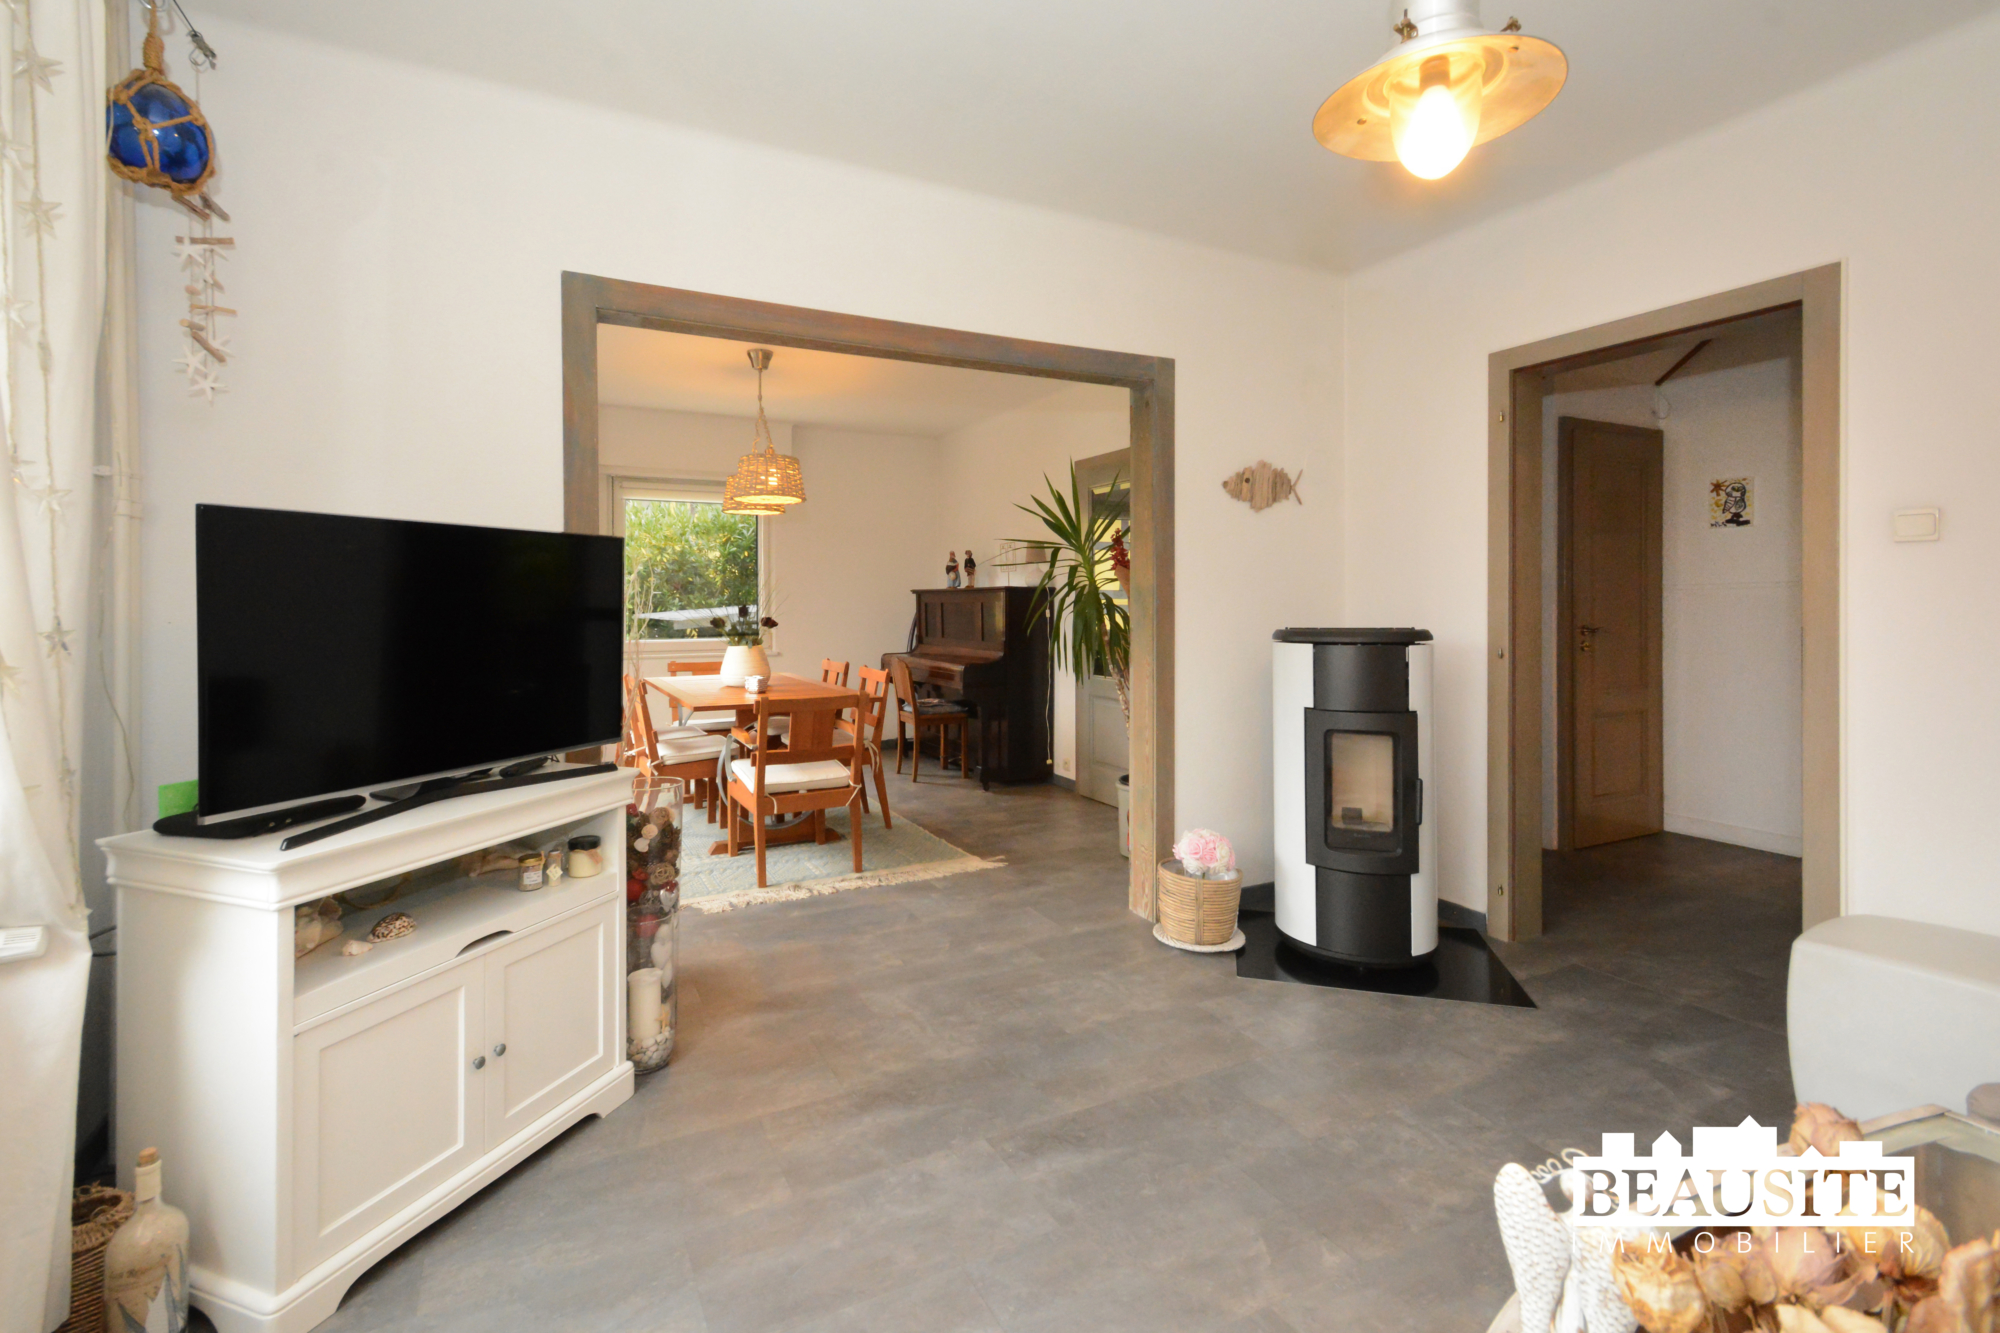 [Haddock] Une superbe maison avec piscine en plein cœur du village - Weyersheim - nos ventes - Beausite Immobilier 1